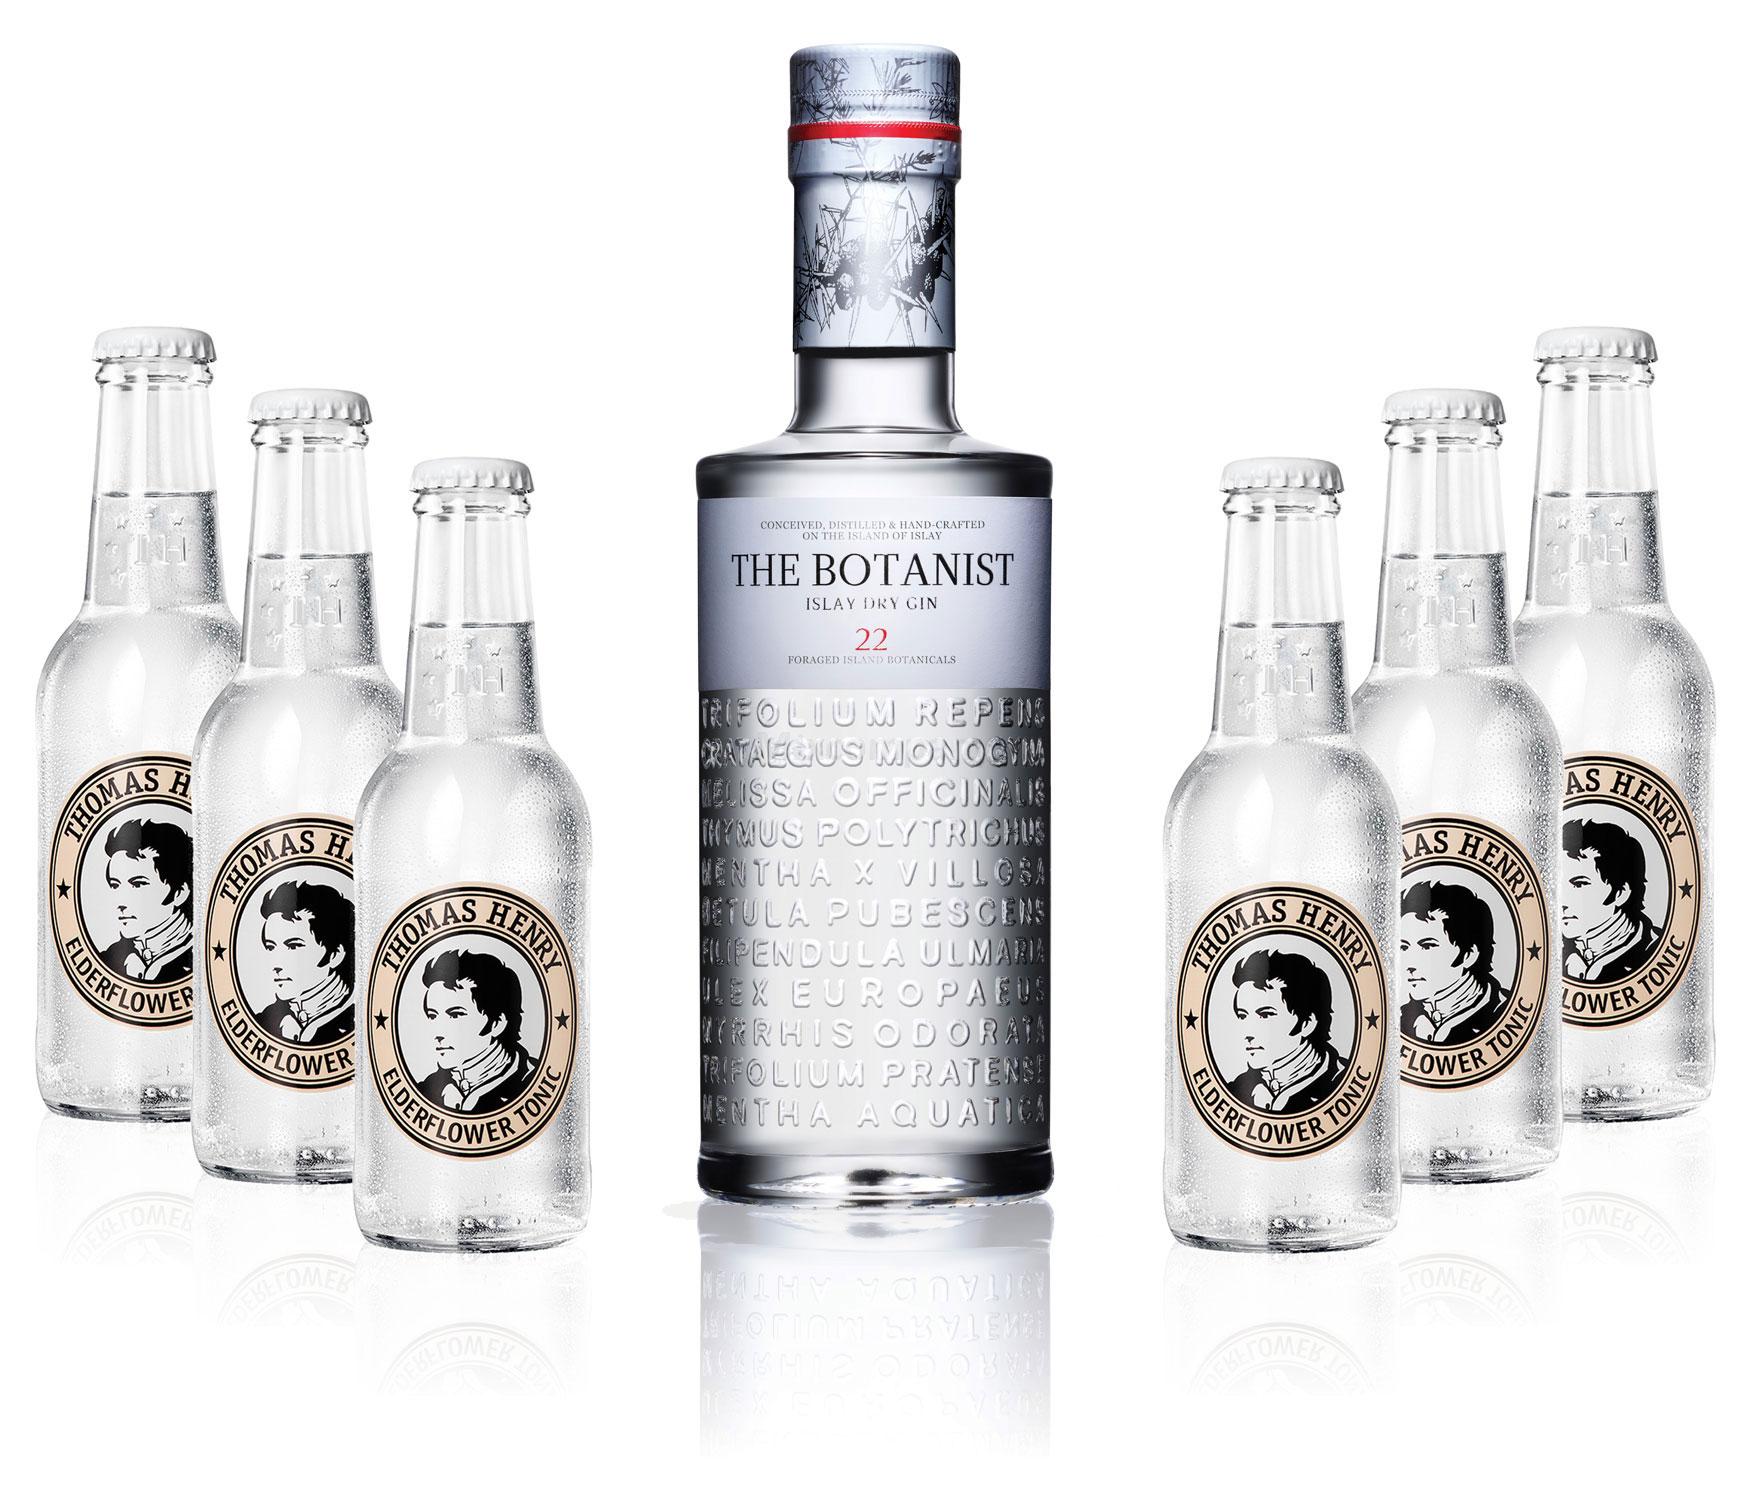 Gin Tonic Set - The Botanist Islay Dry Gin 0,7l 700ml (46% Vol) + 6x Thomas Henry Elderflower Tonic Water 200ml inkl. Pfand MEHRWEG